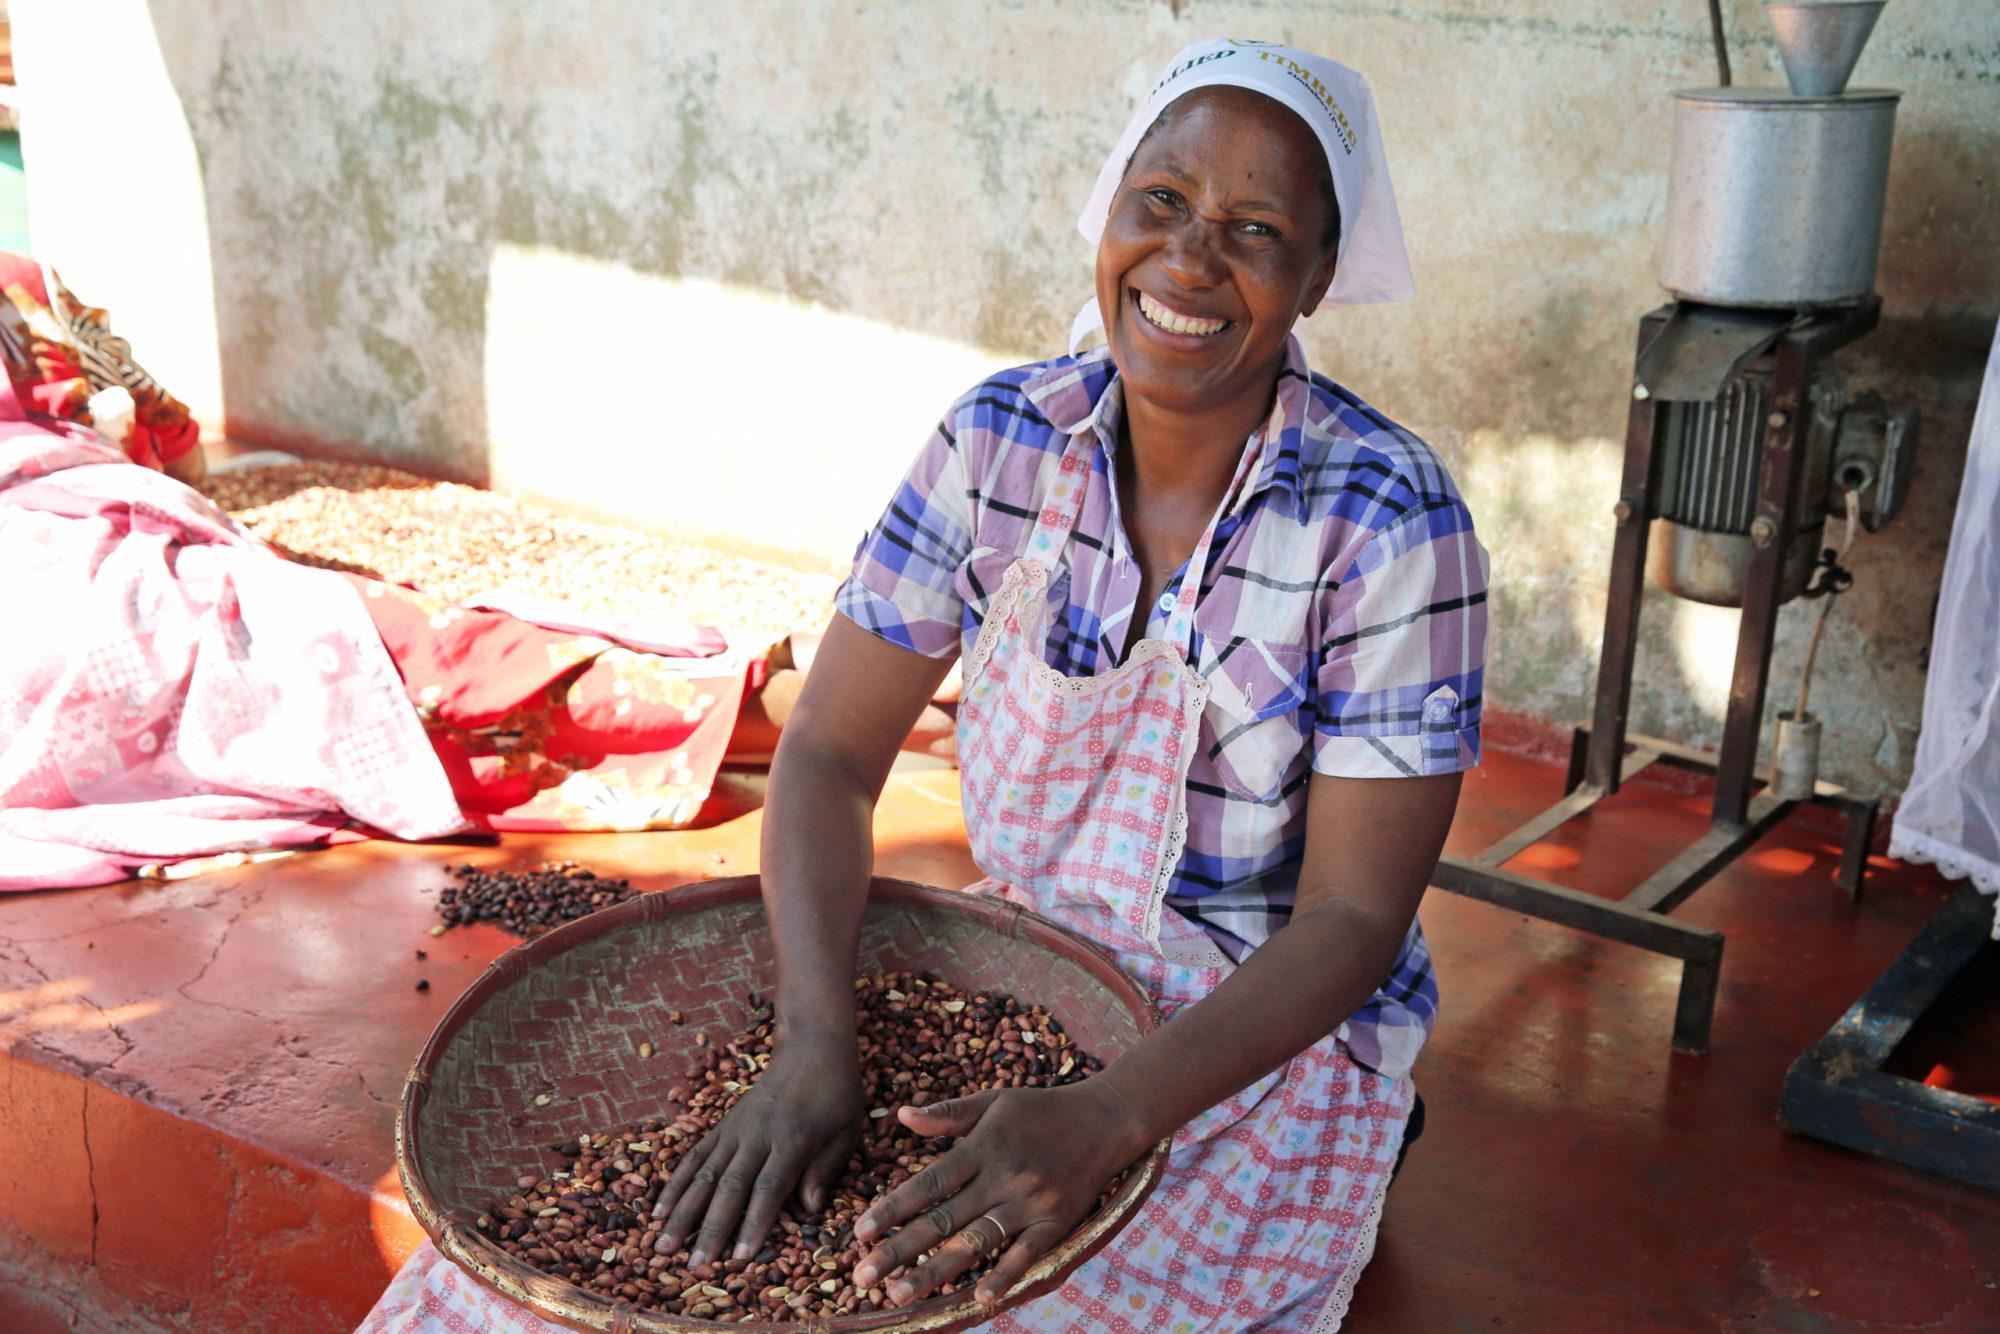 Zimbabwe, informal economy, worker rights, Solidarity Center